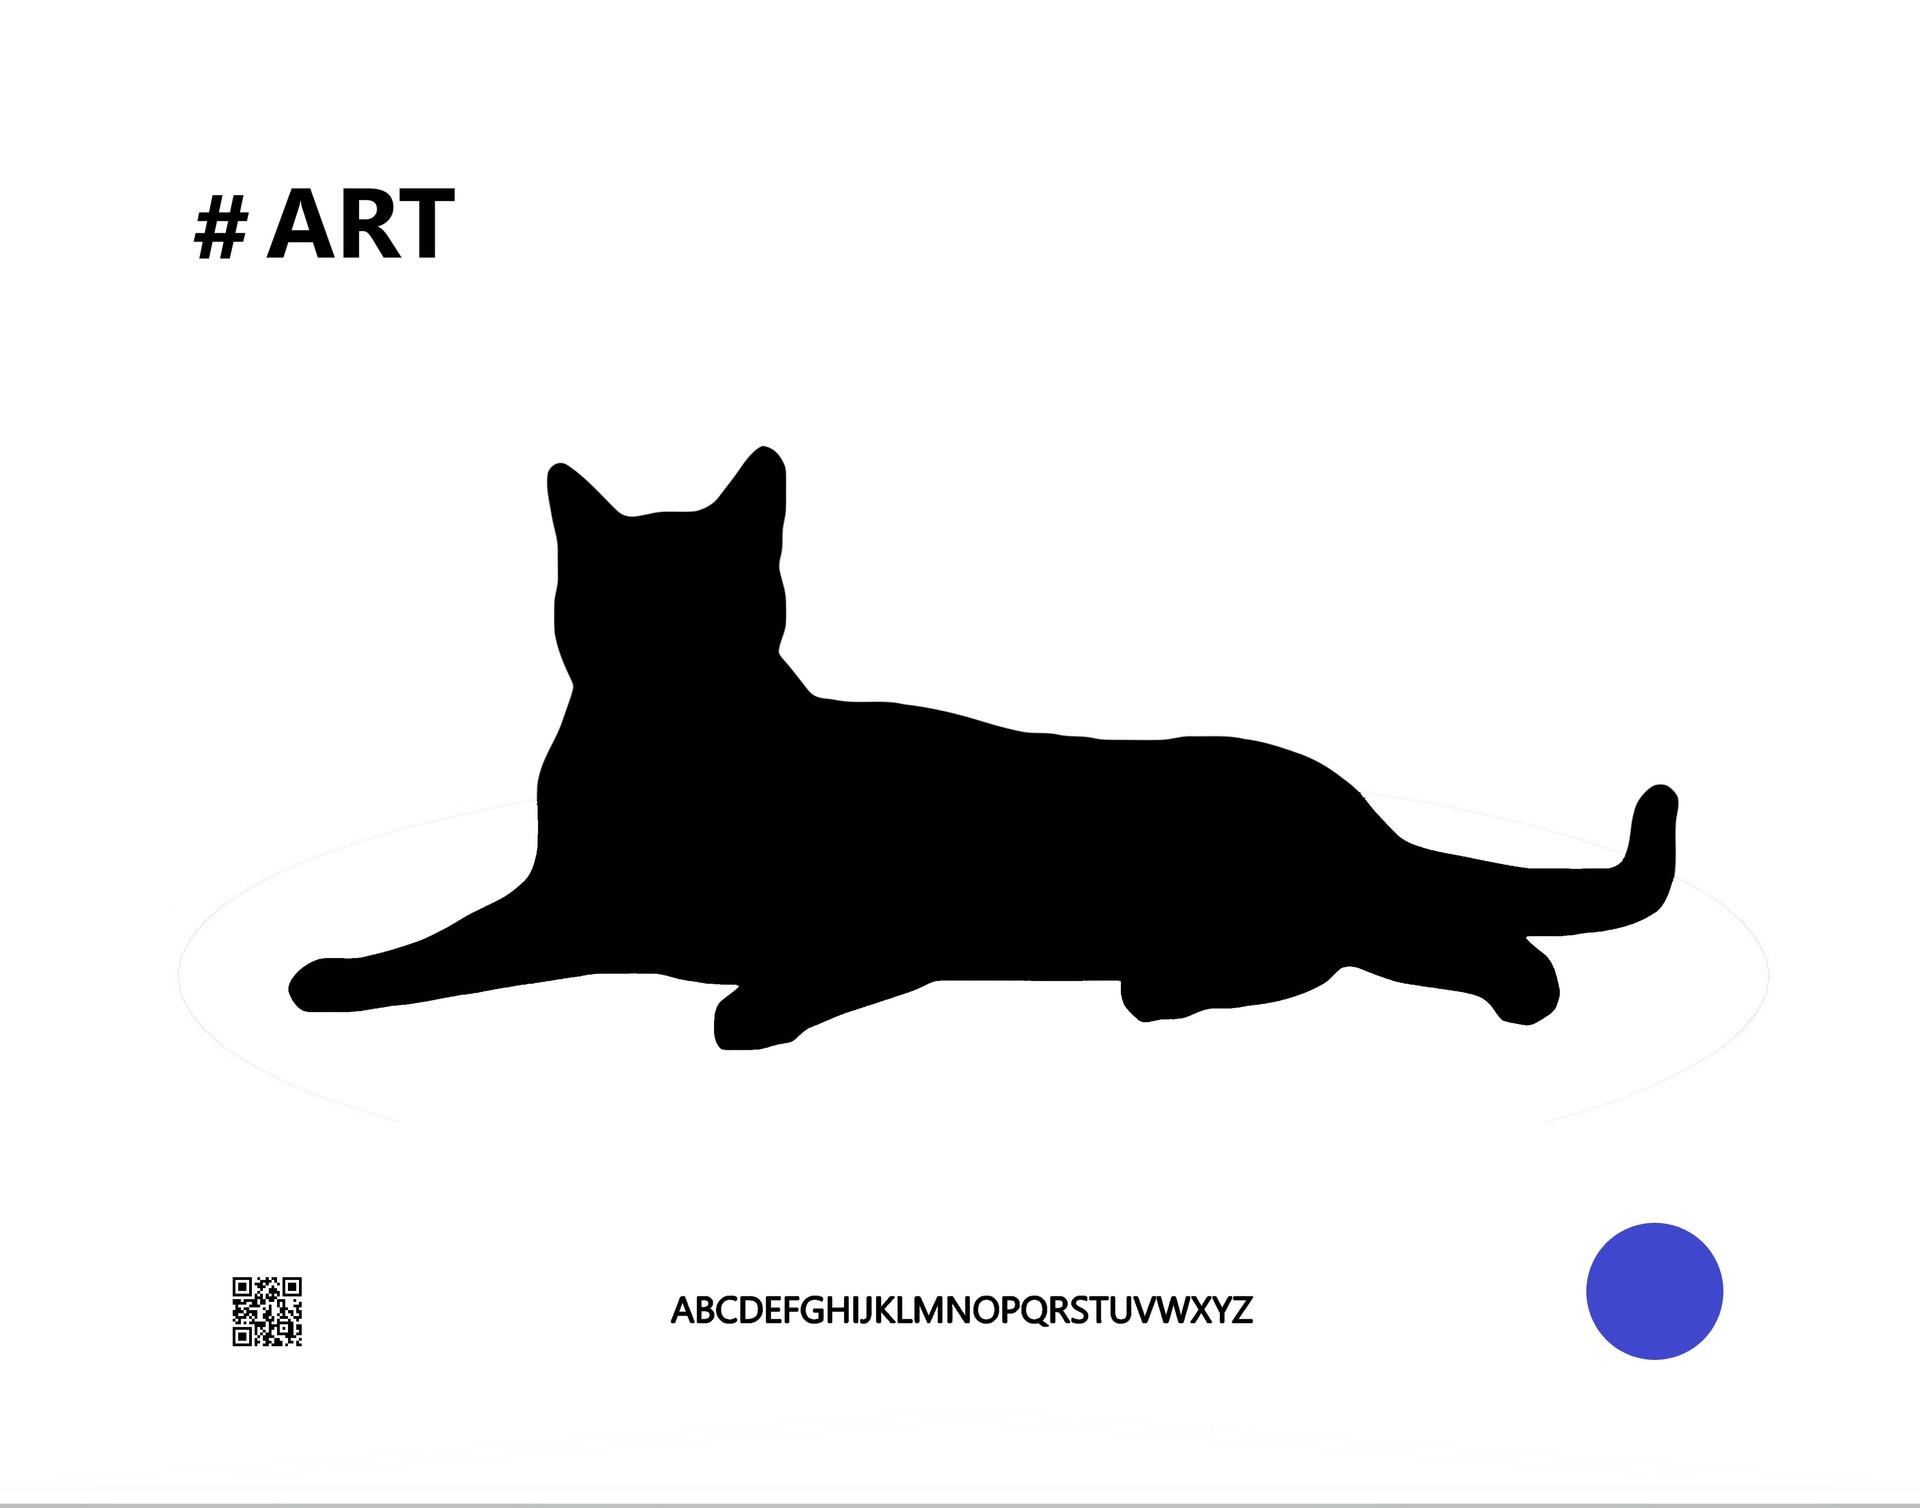 catblackbcart11x14.jpg